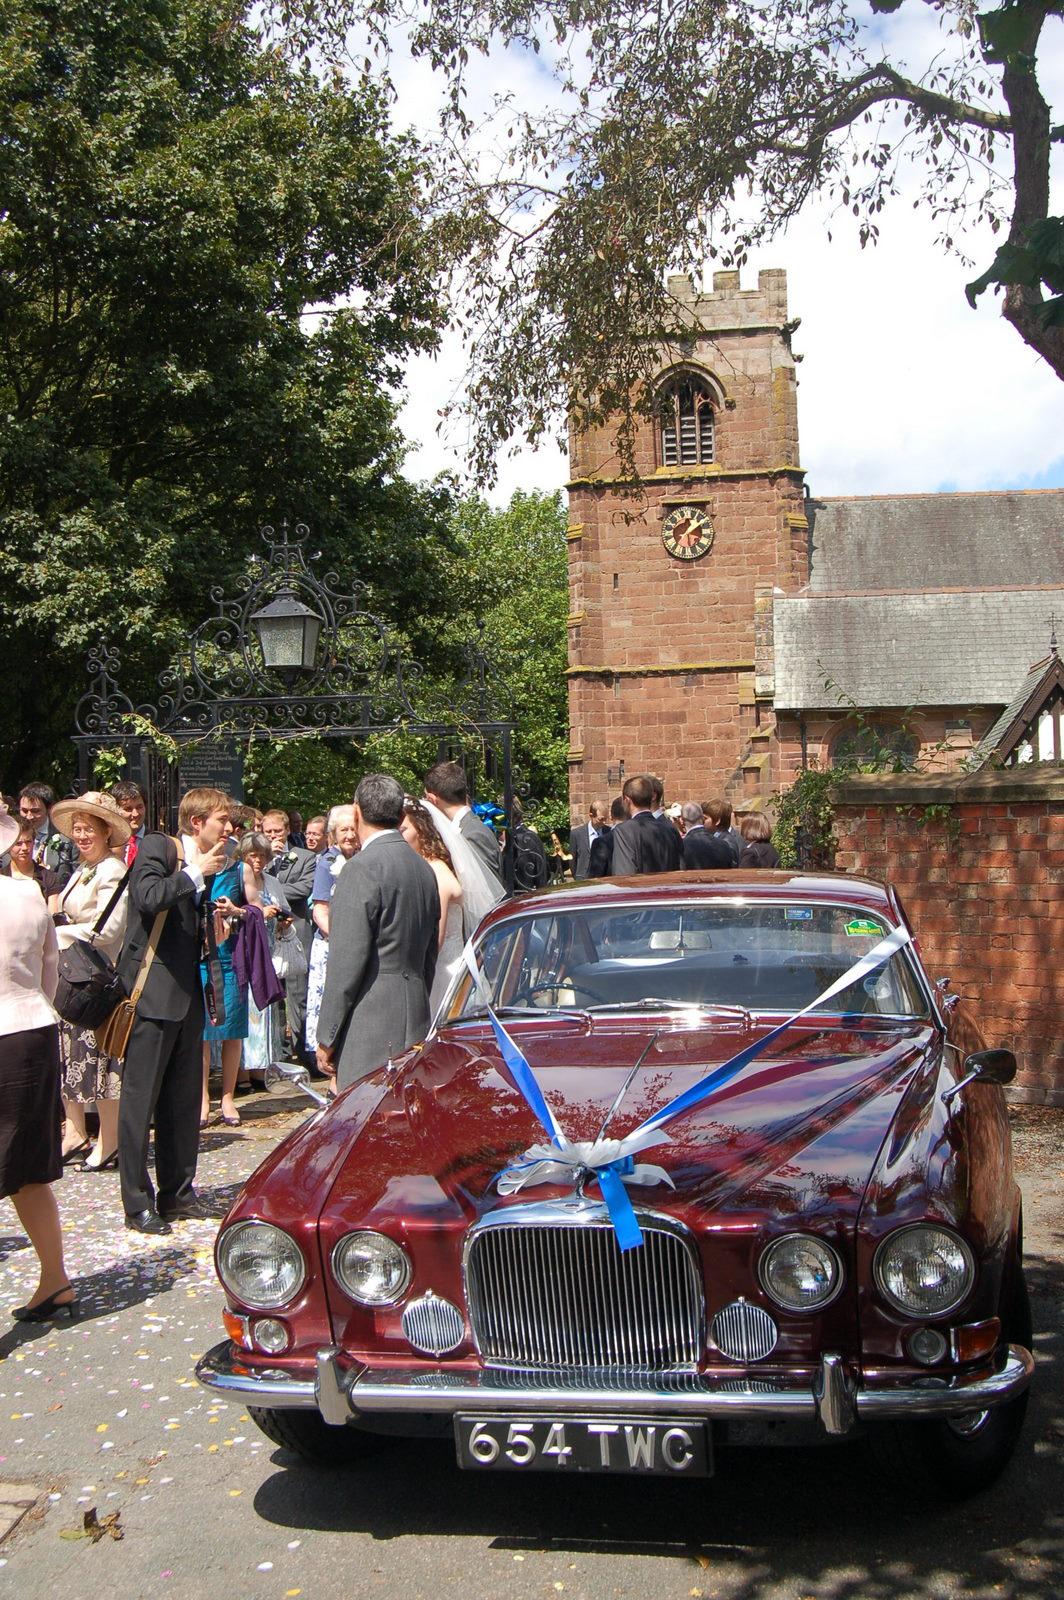 Car at church